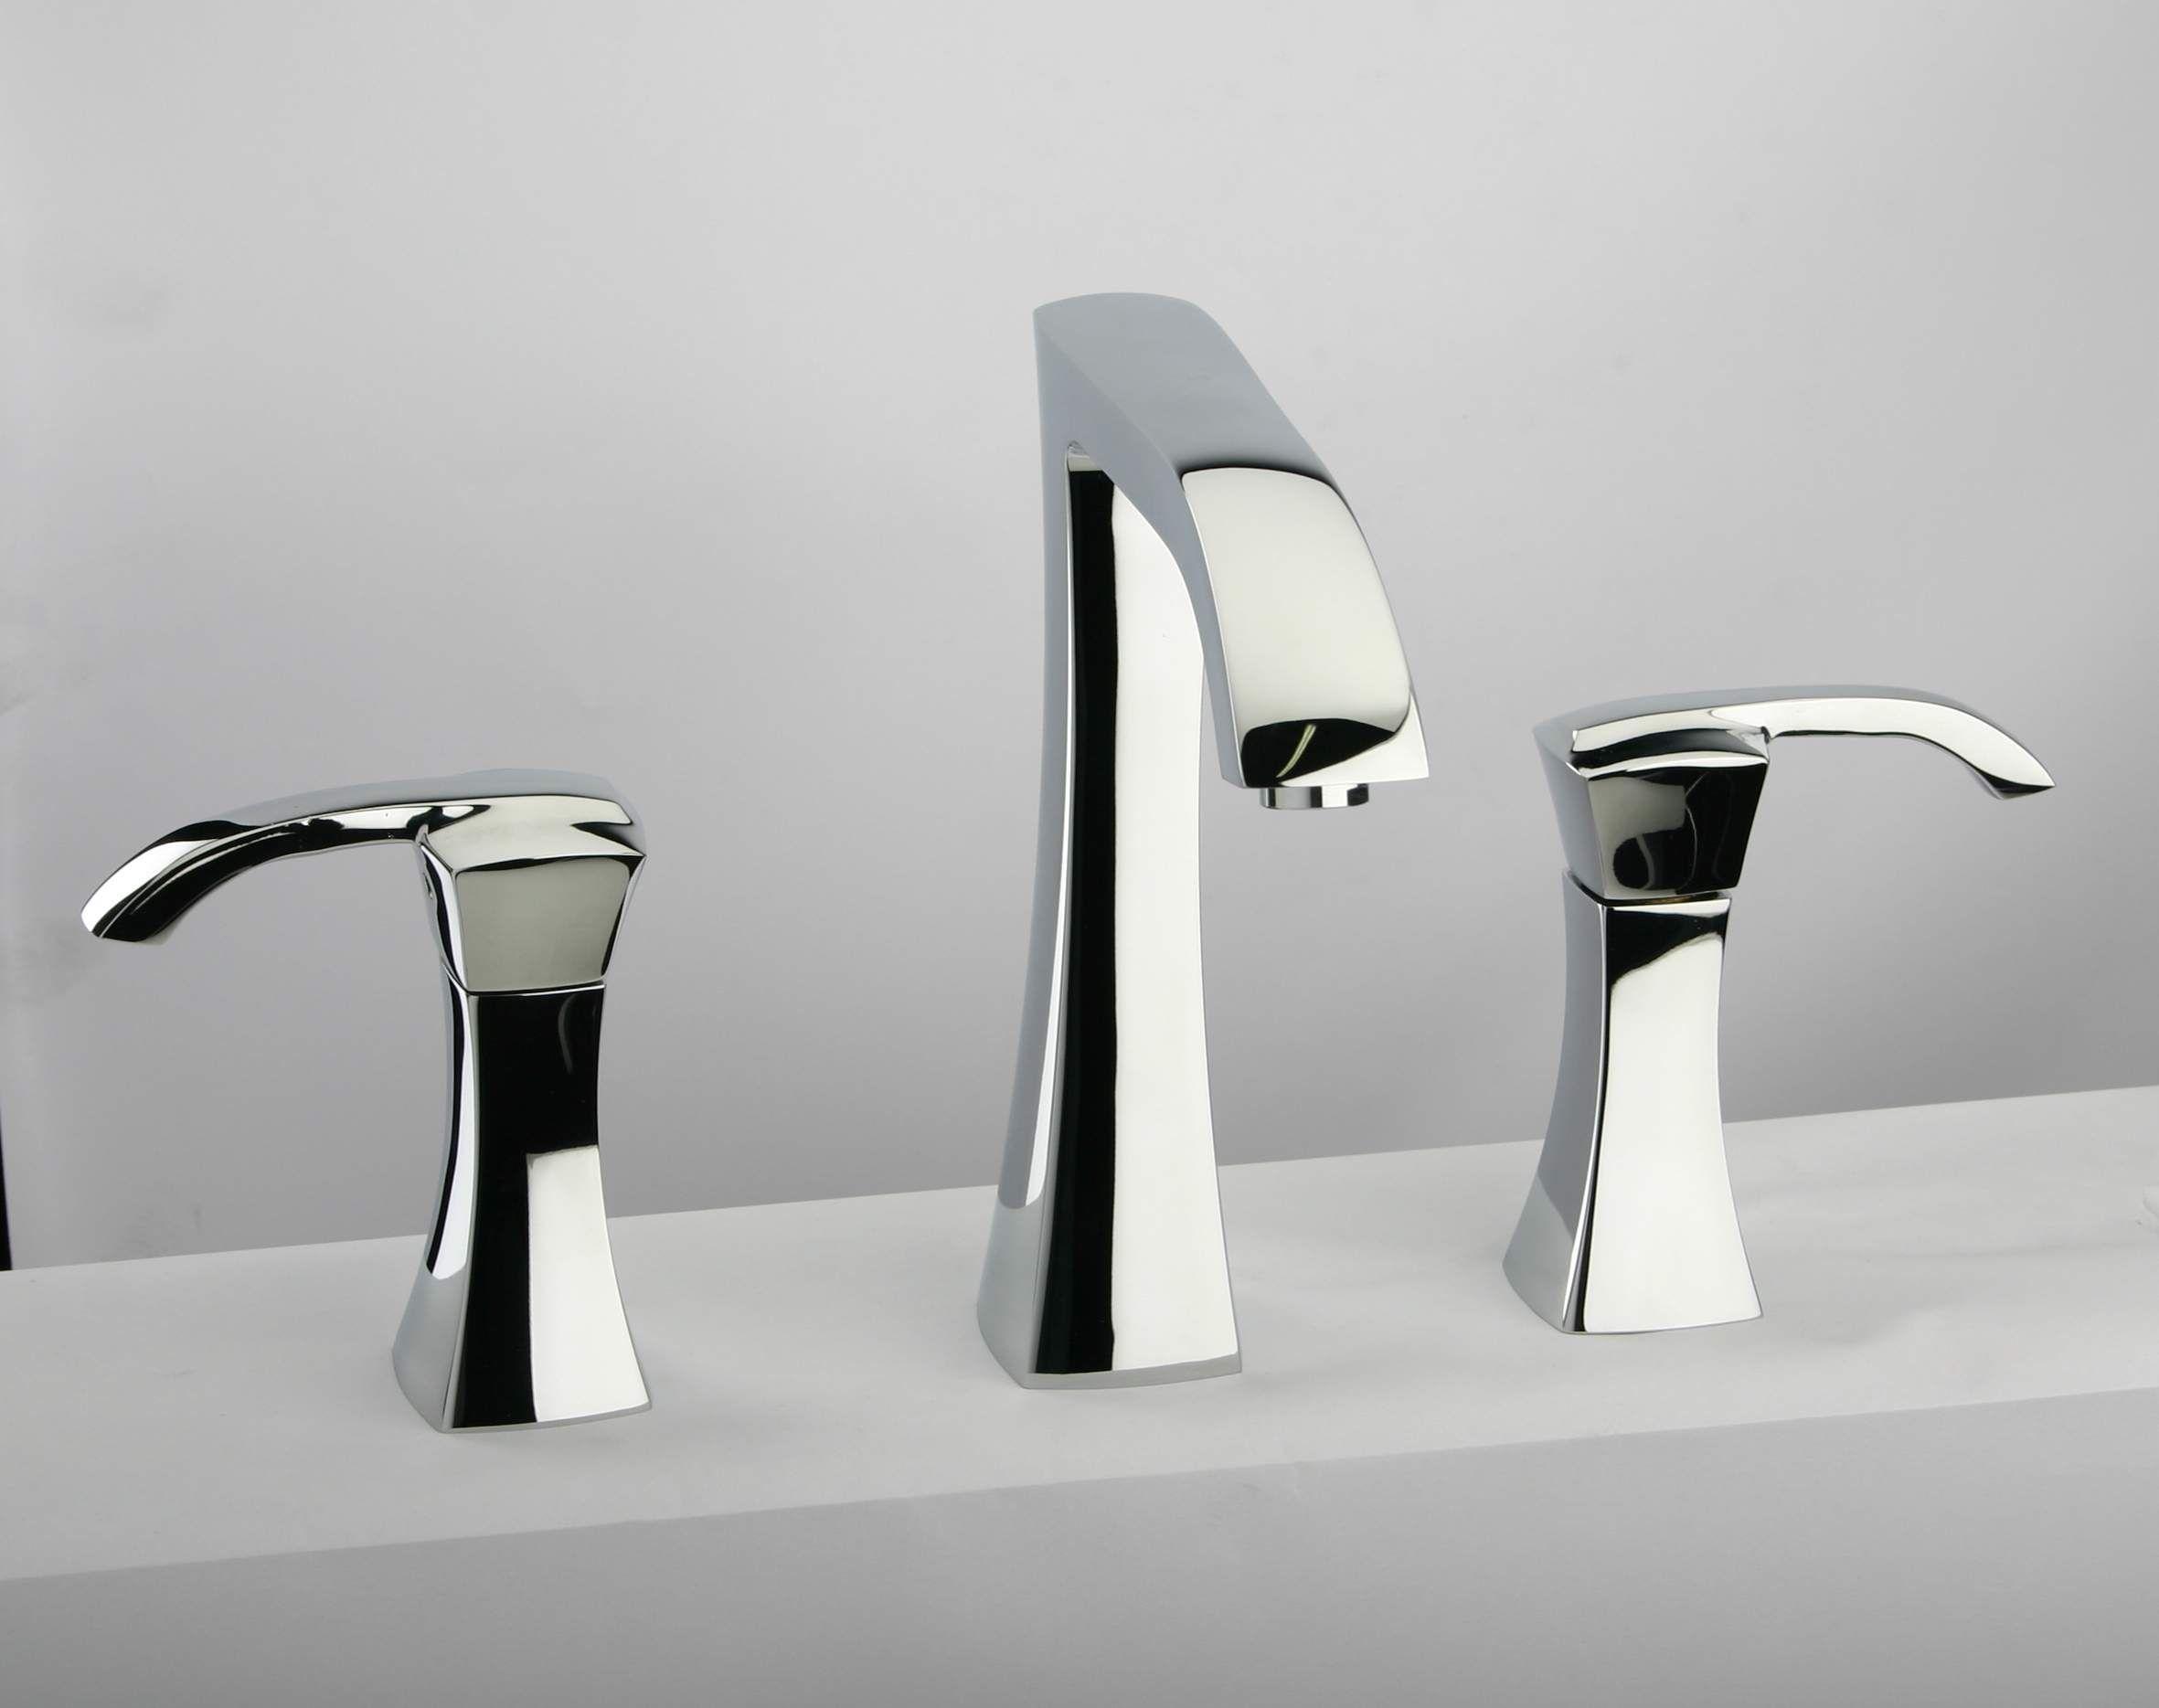 Bathroom Fixtures For A Designer Bathroom Grohe Faucet Bathroom Faucets